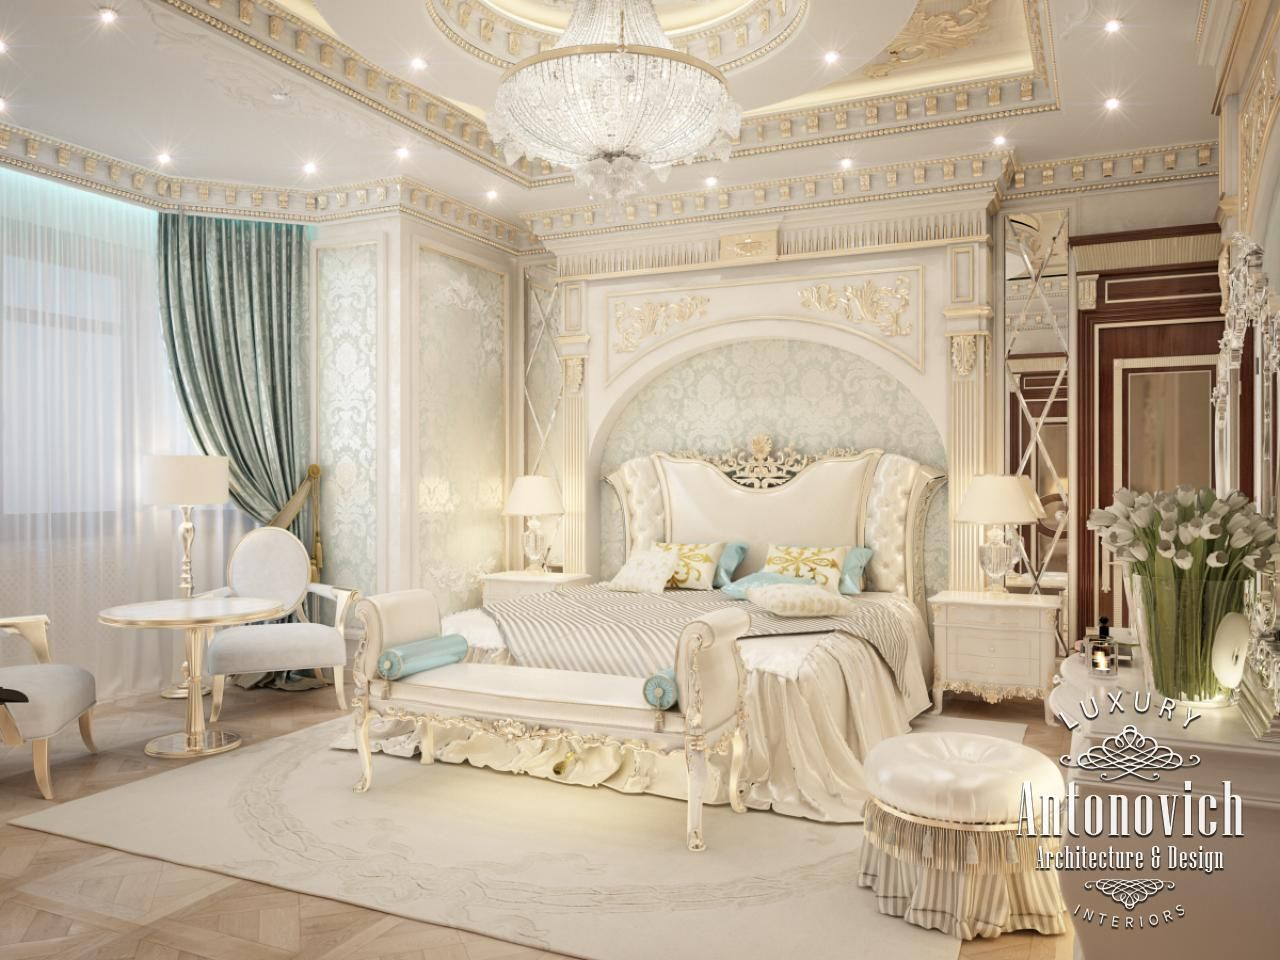 Bedroom Design In Dubai Gorgeous Bedroom Photo 1 Luxurious